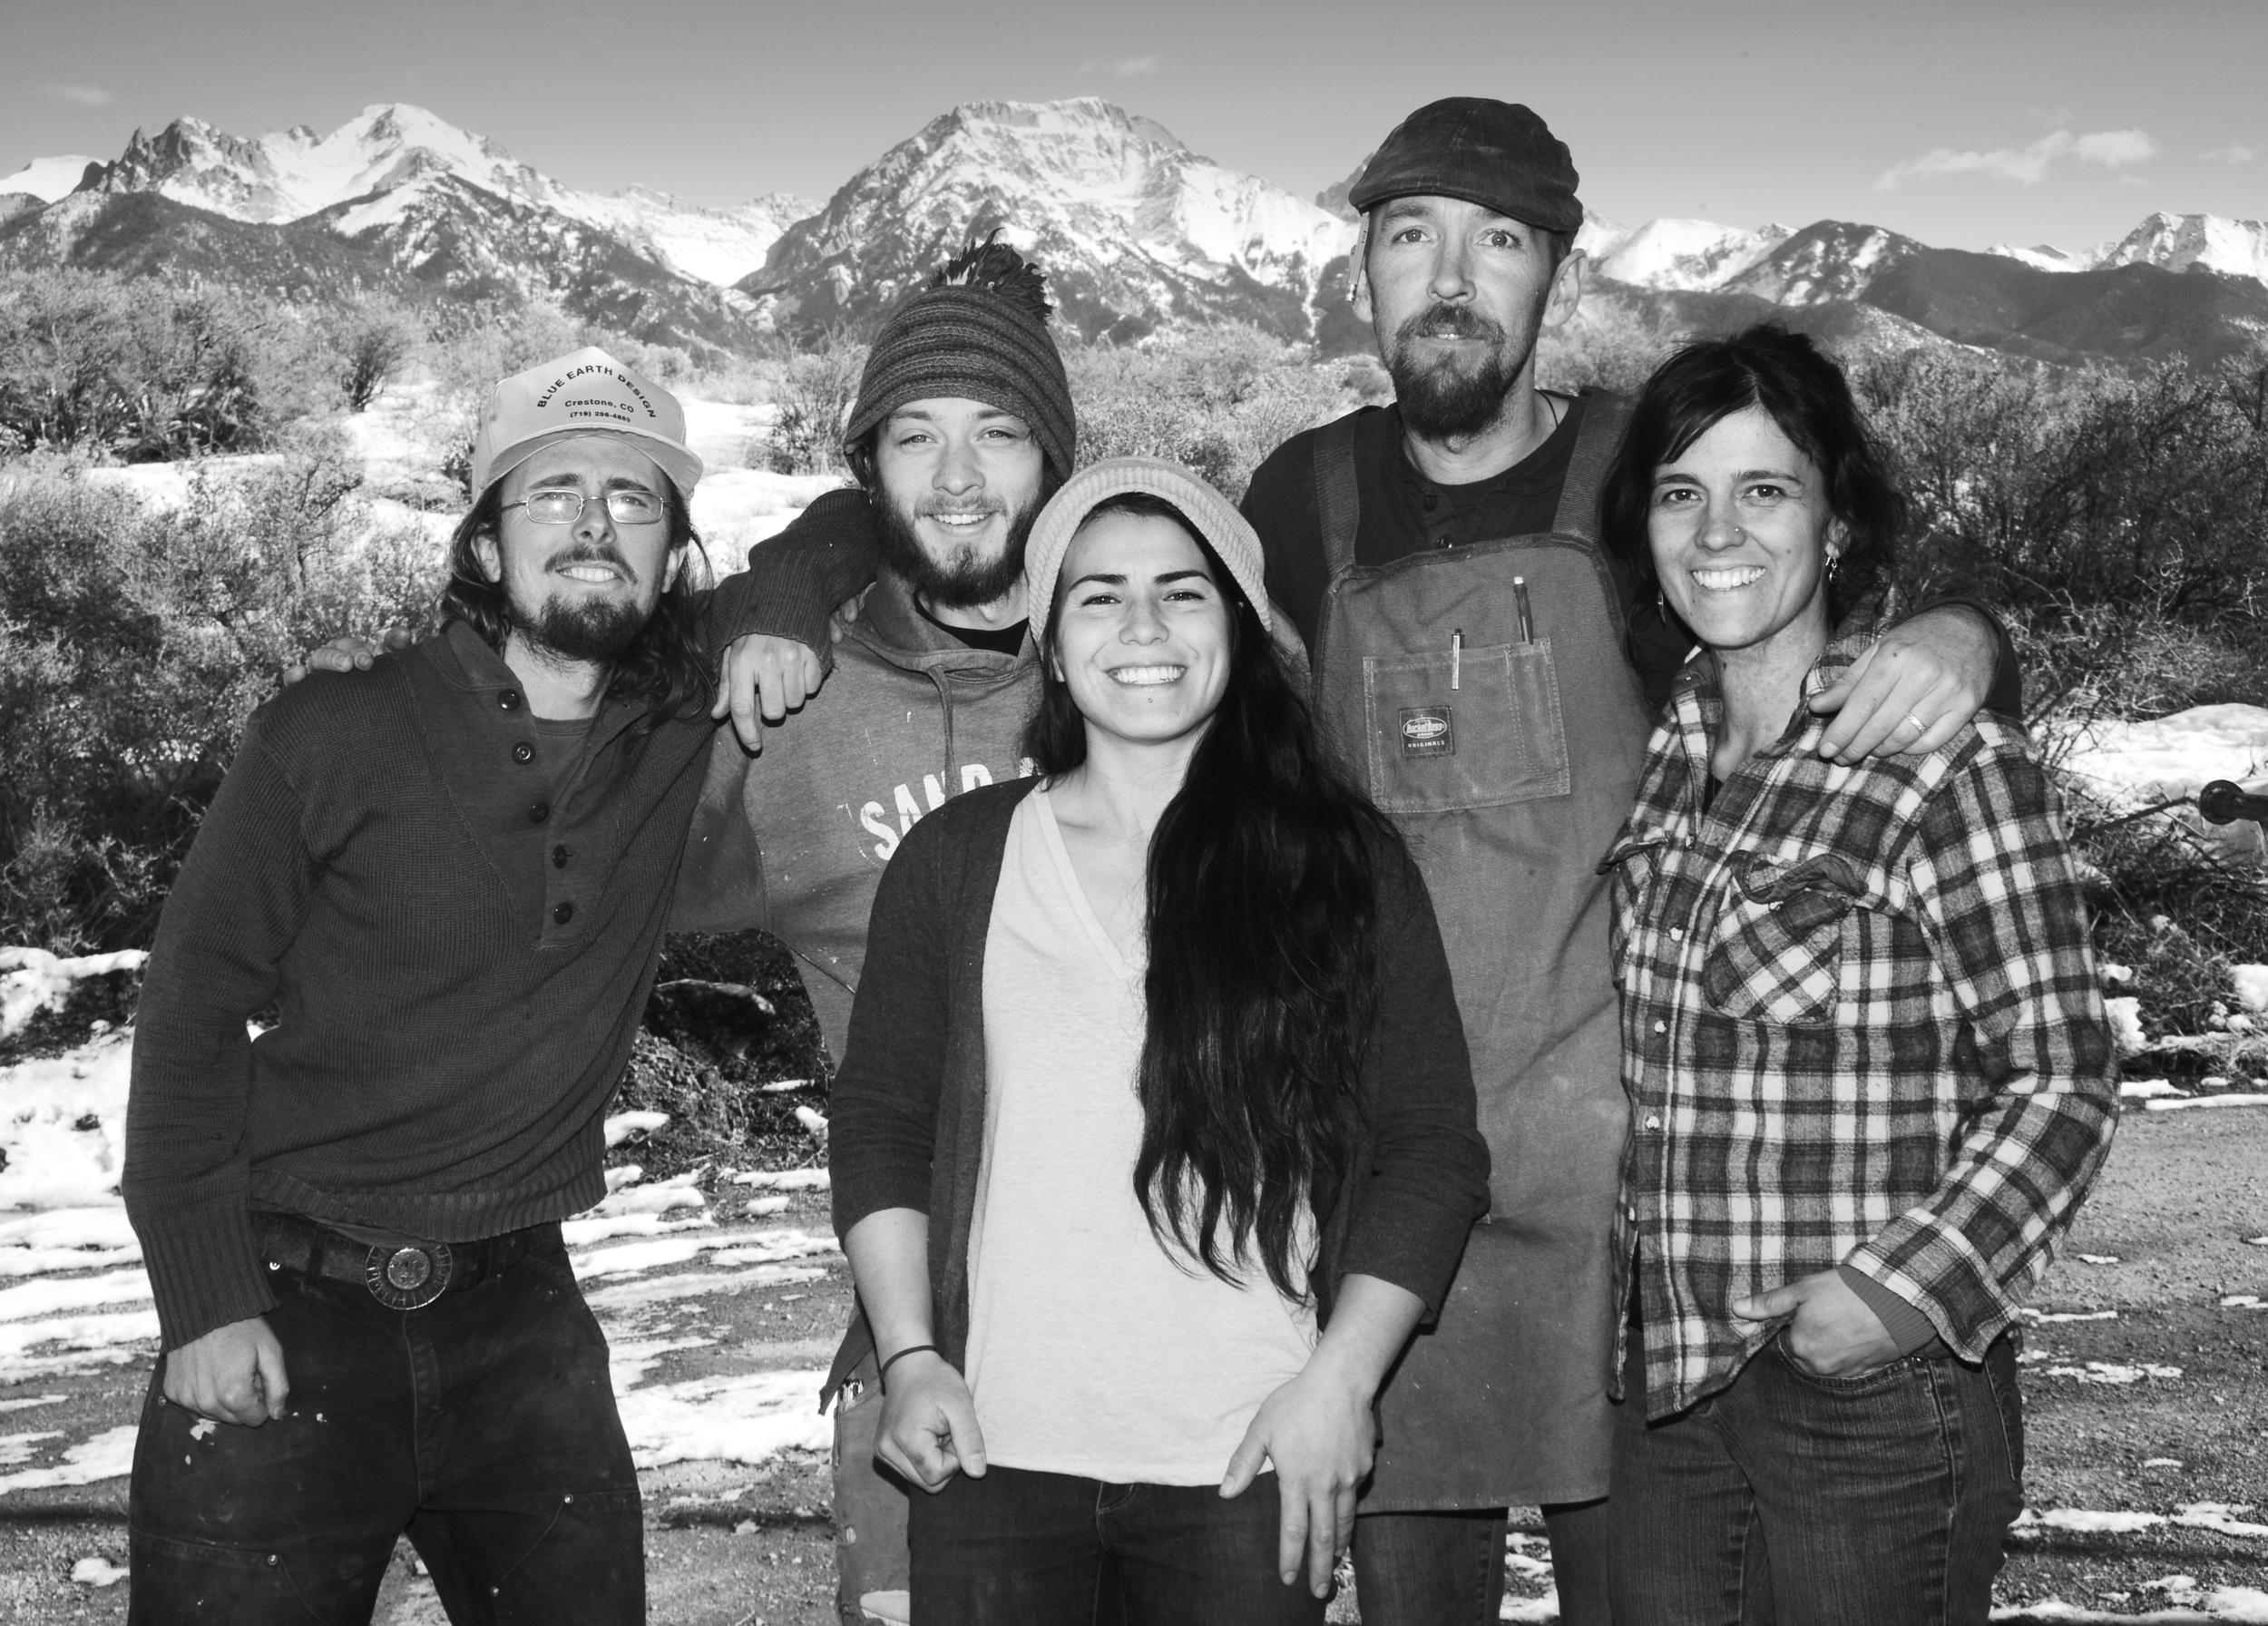 Jeff, Julian, Lily, Adam and Cristina  photo credit: Dara Blumenhein